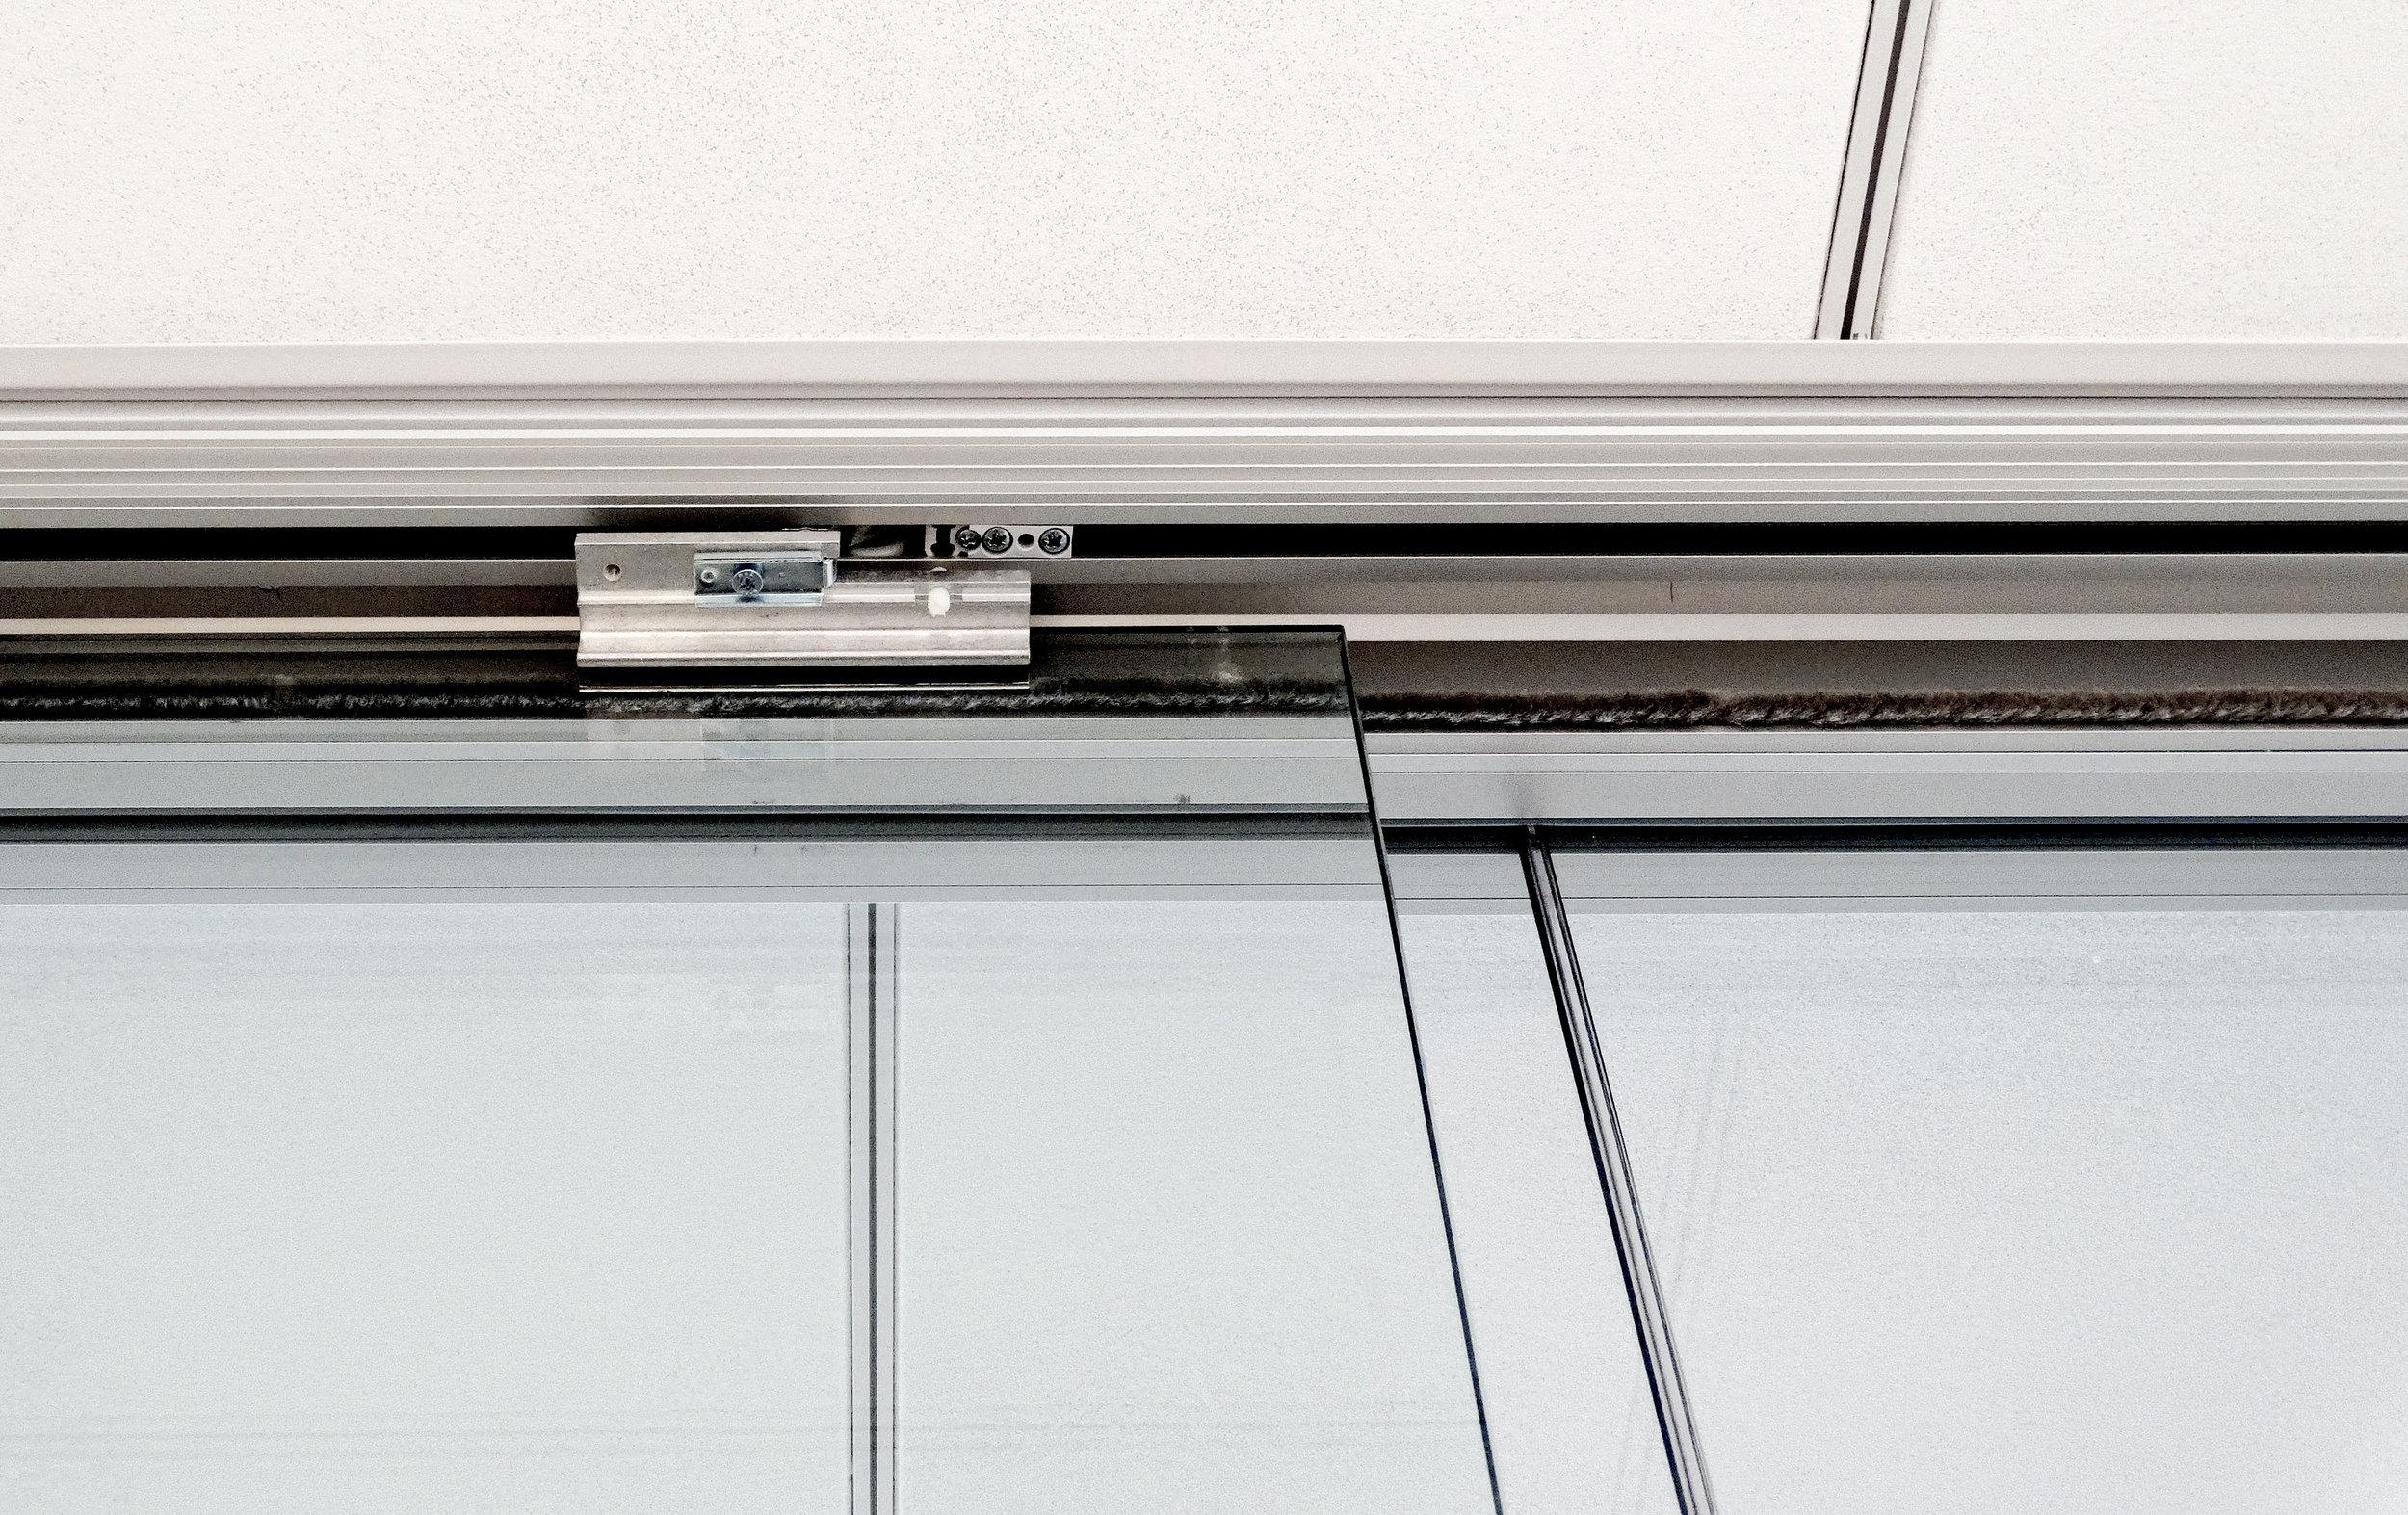 Litespace Sliding Door Head Track Hardware - Spaceworks AI.jpg